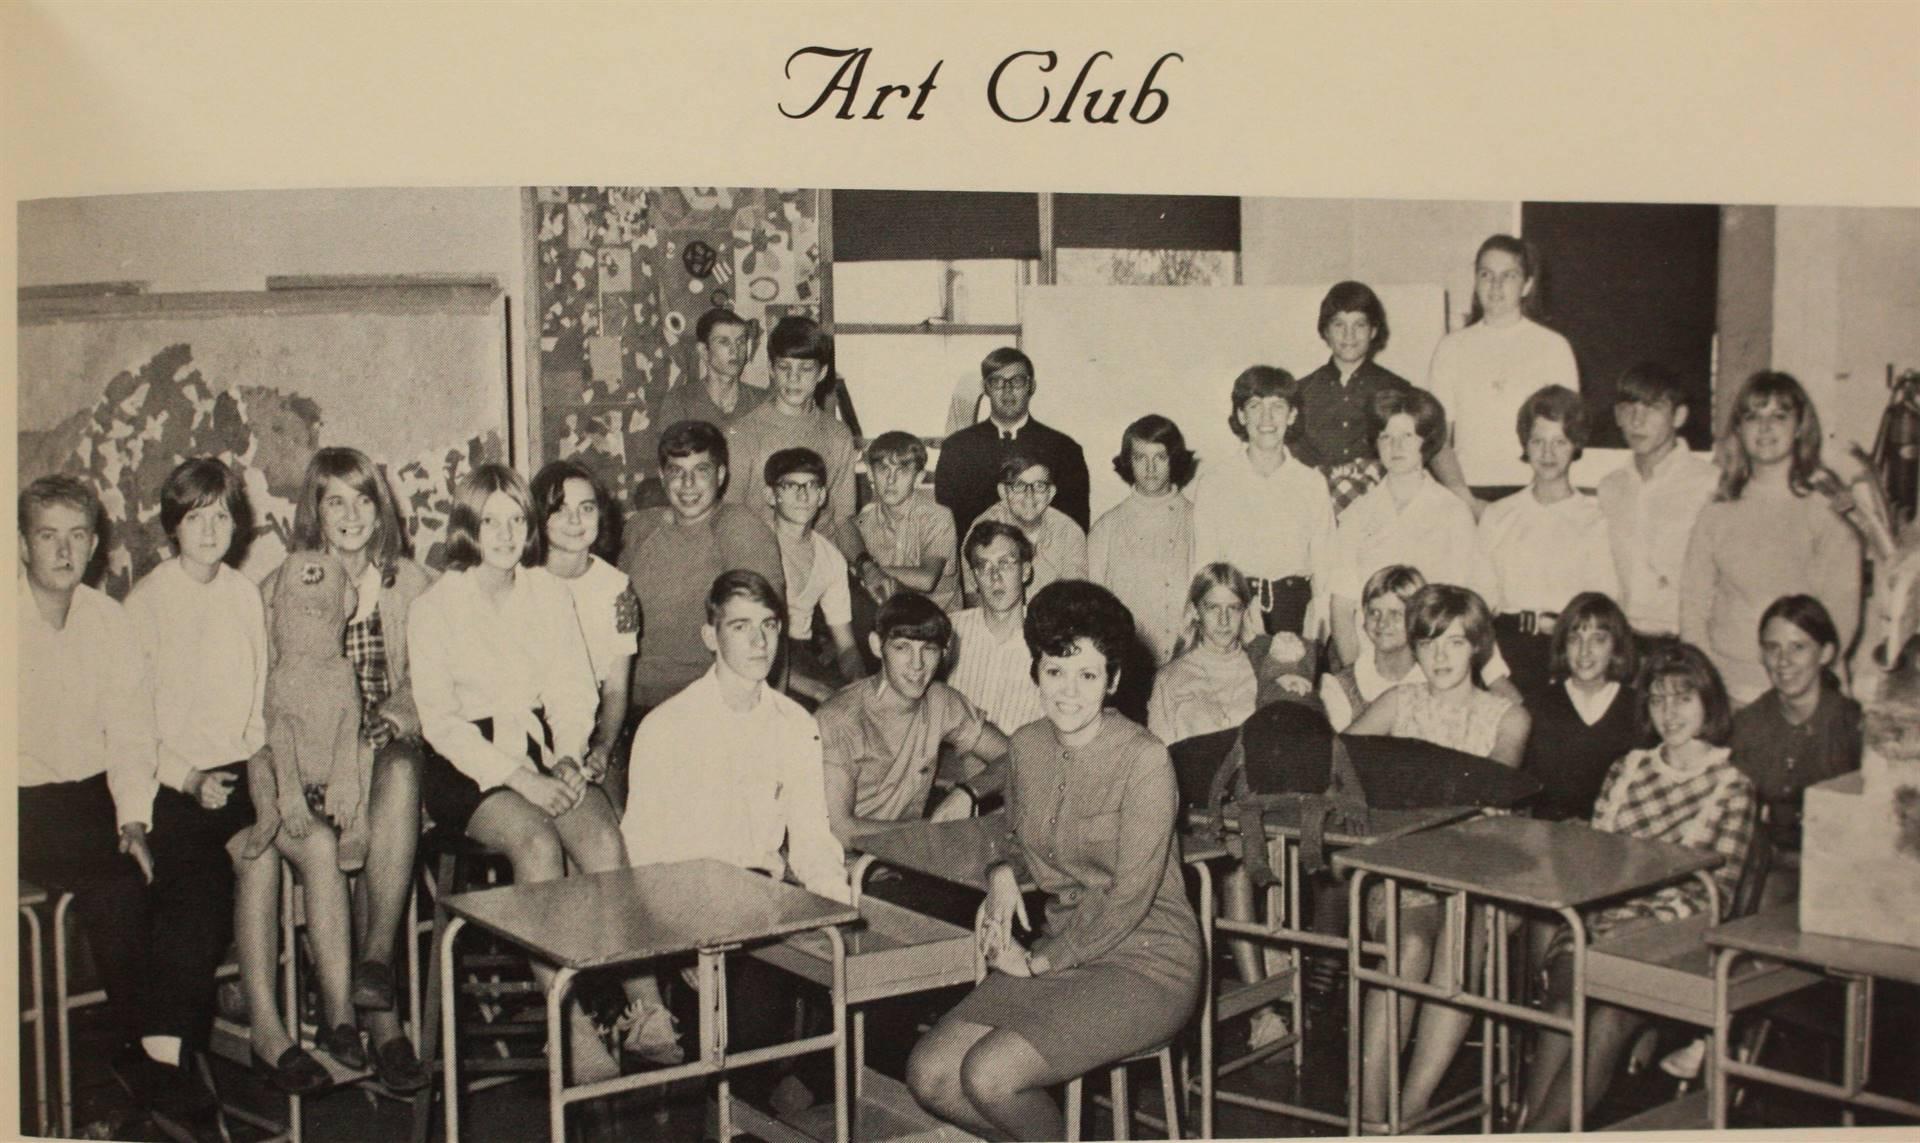 1970 Art Club